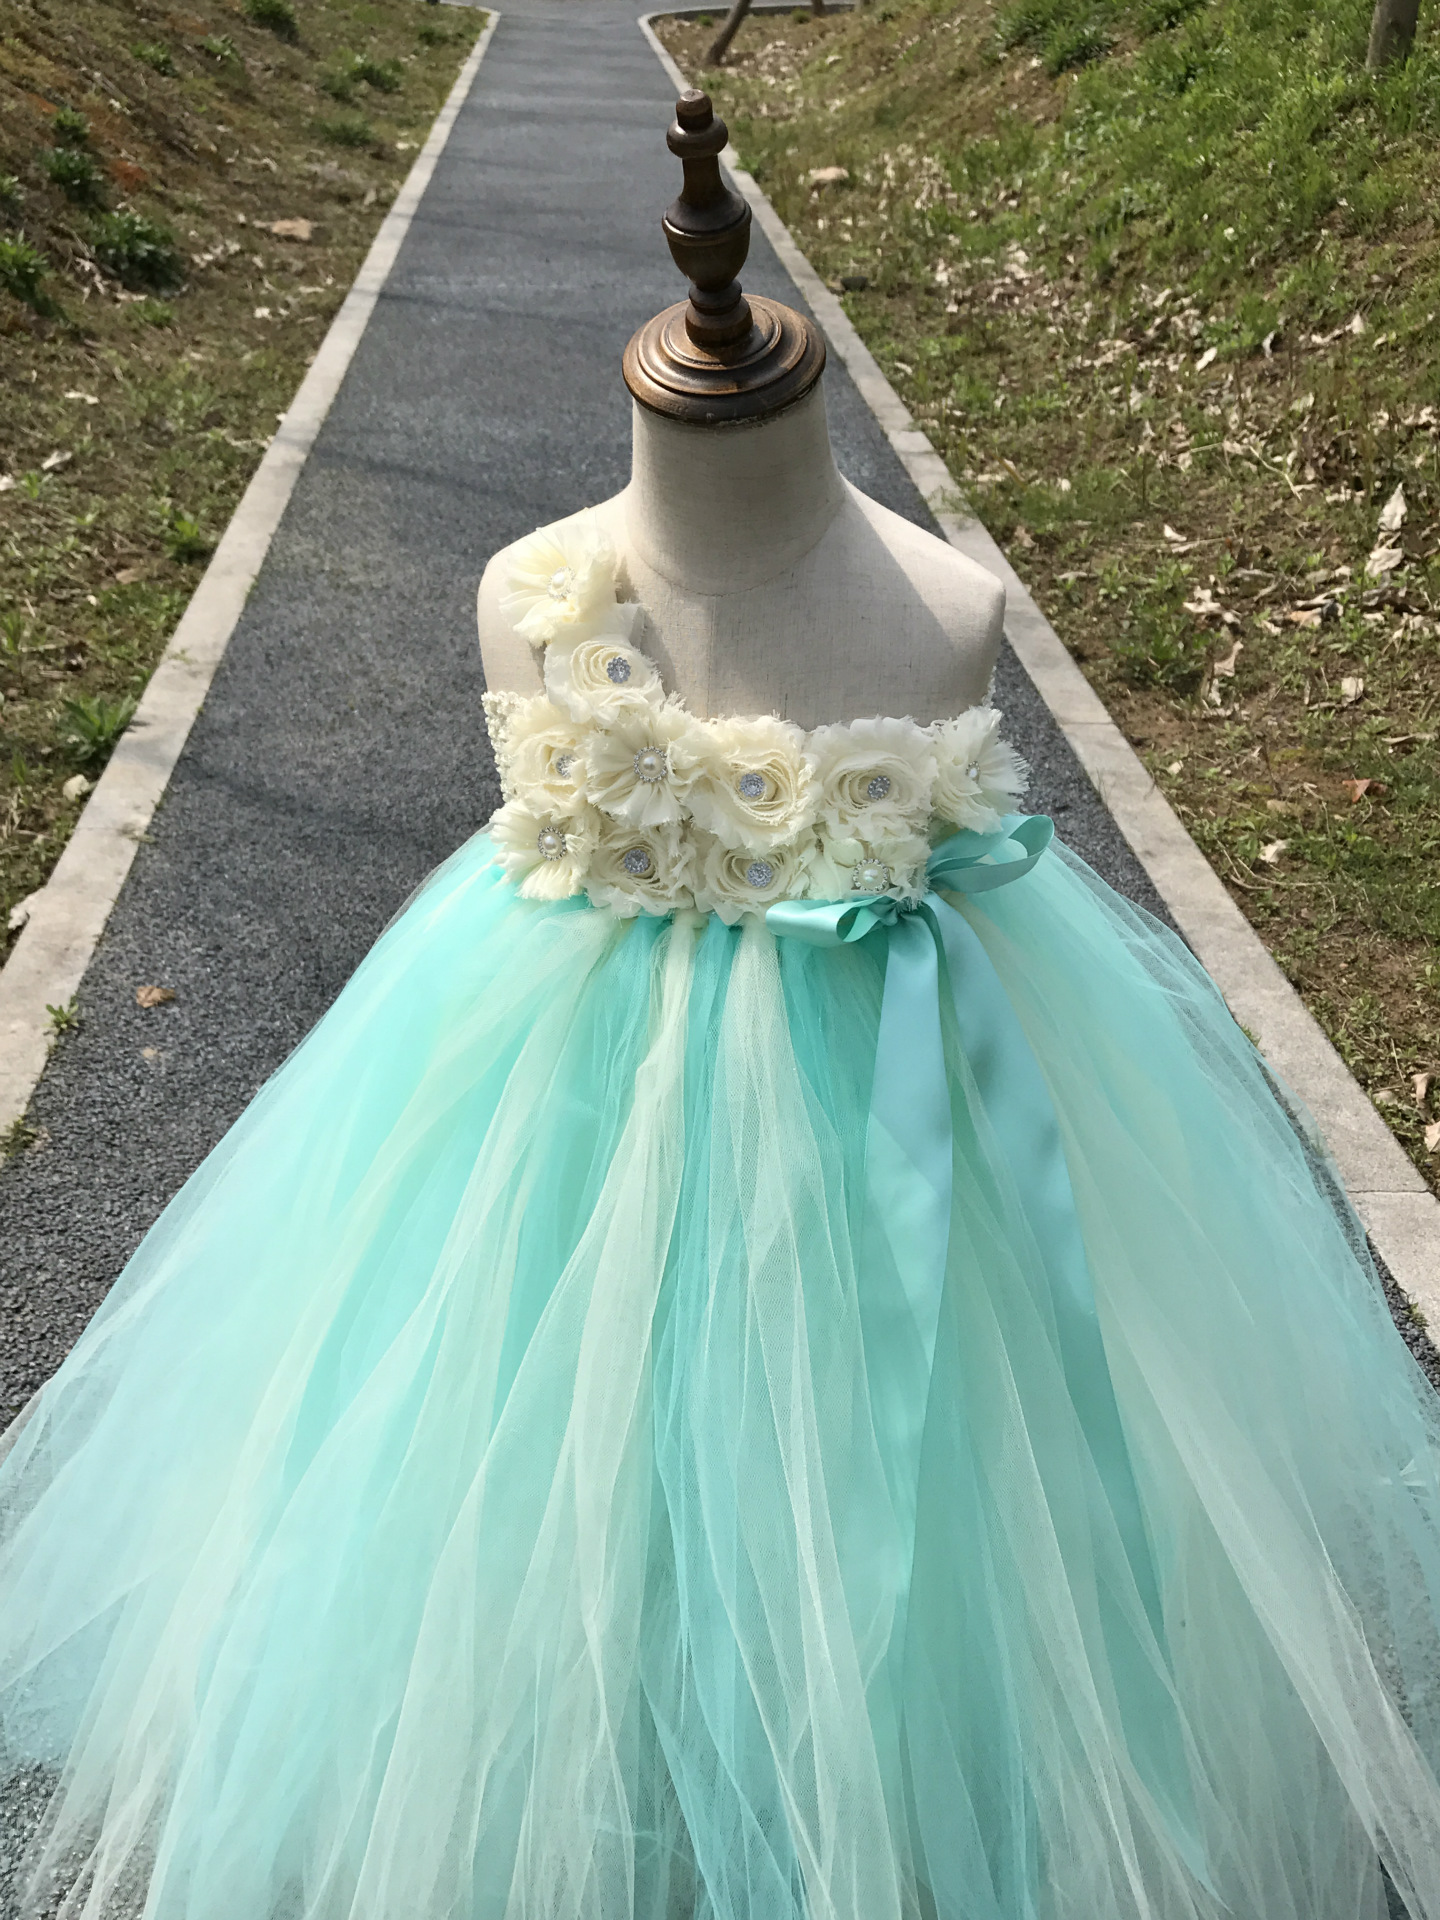 c1fb7db06f78 Pink and Grey Flower Girl Tutu Dress Wedding Tulle Dress Girls Wedding  Dresses Robe Demoiselle D. sku: 32954101309